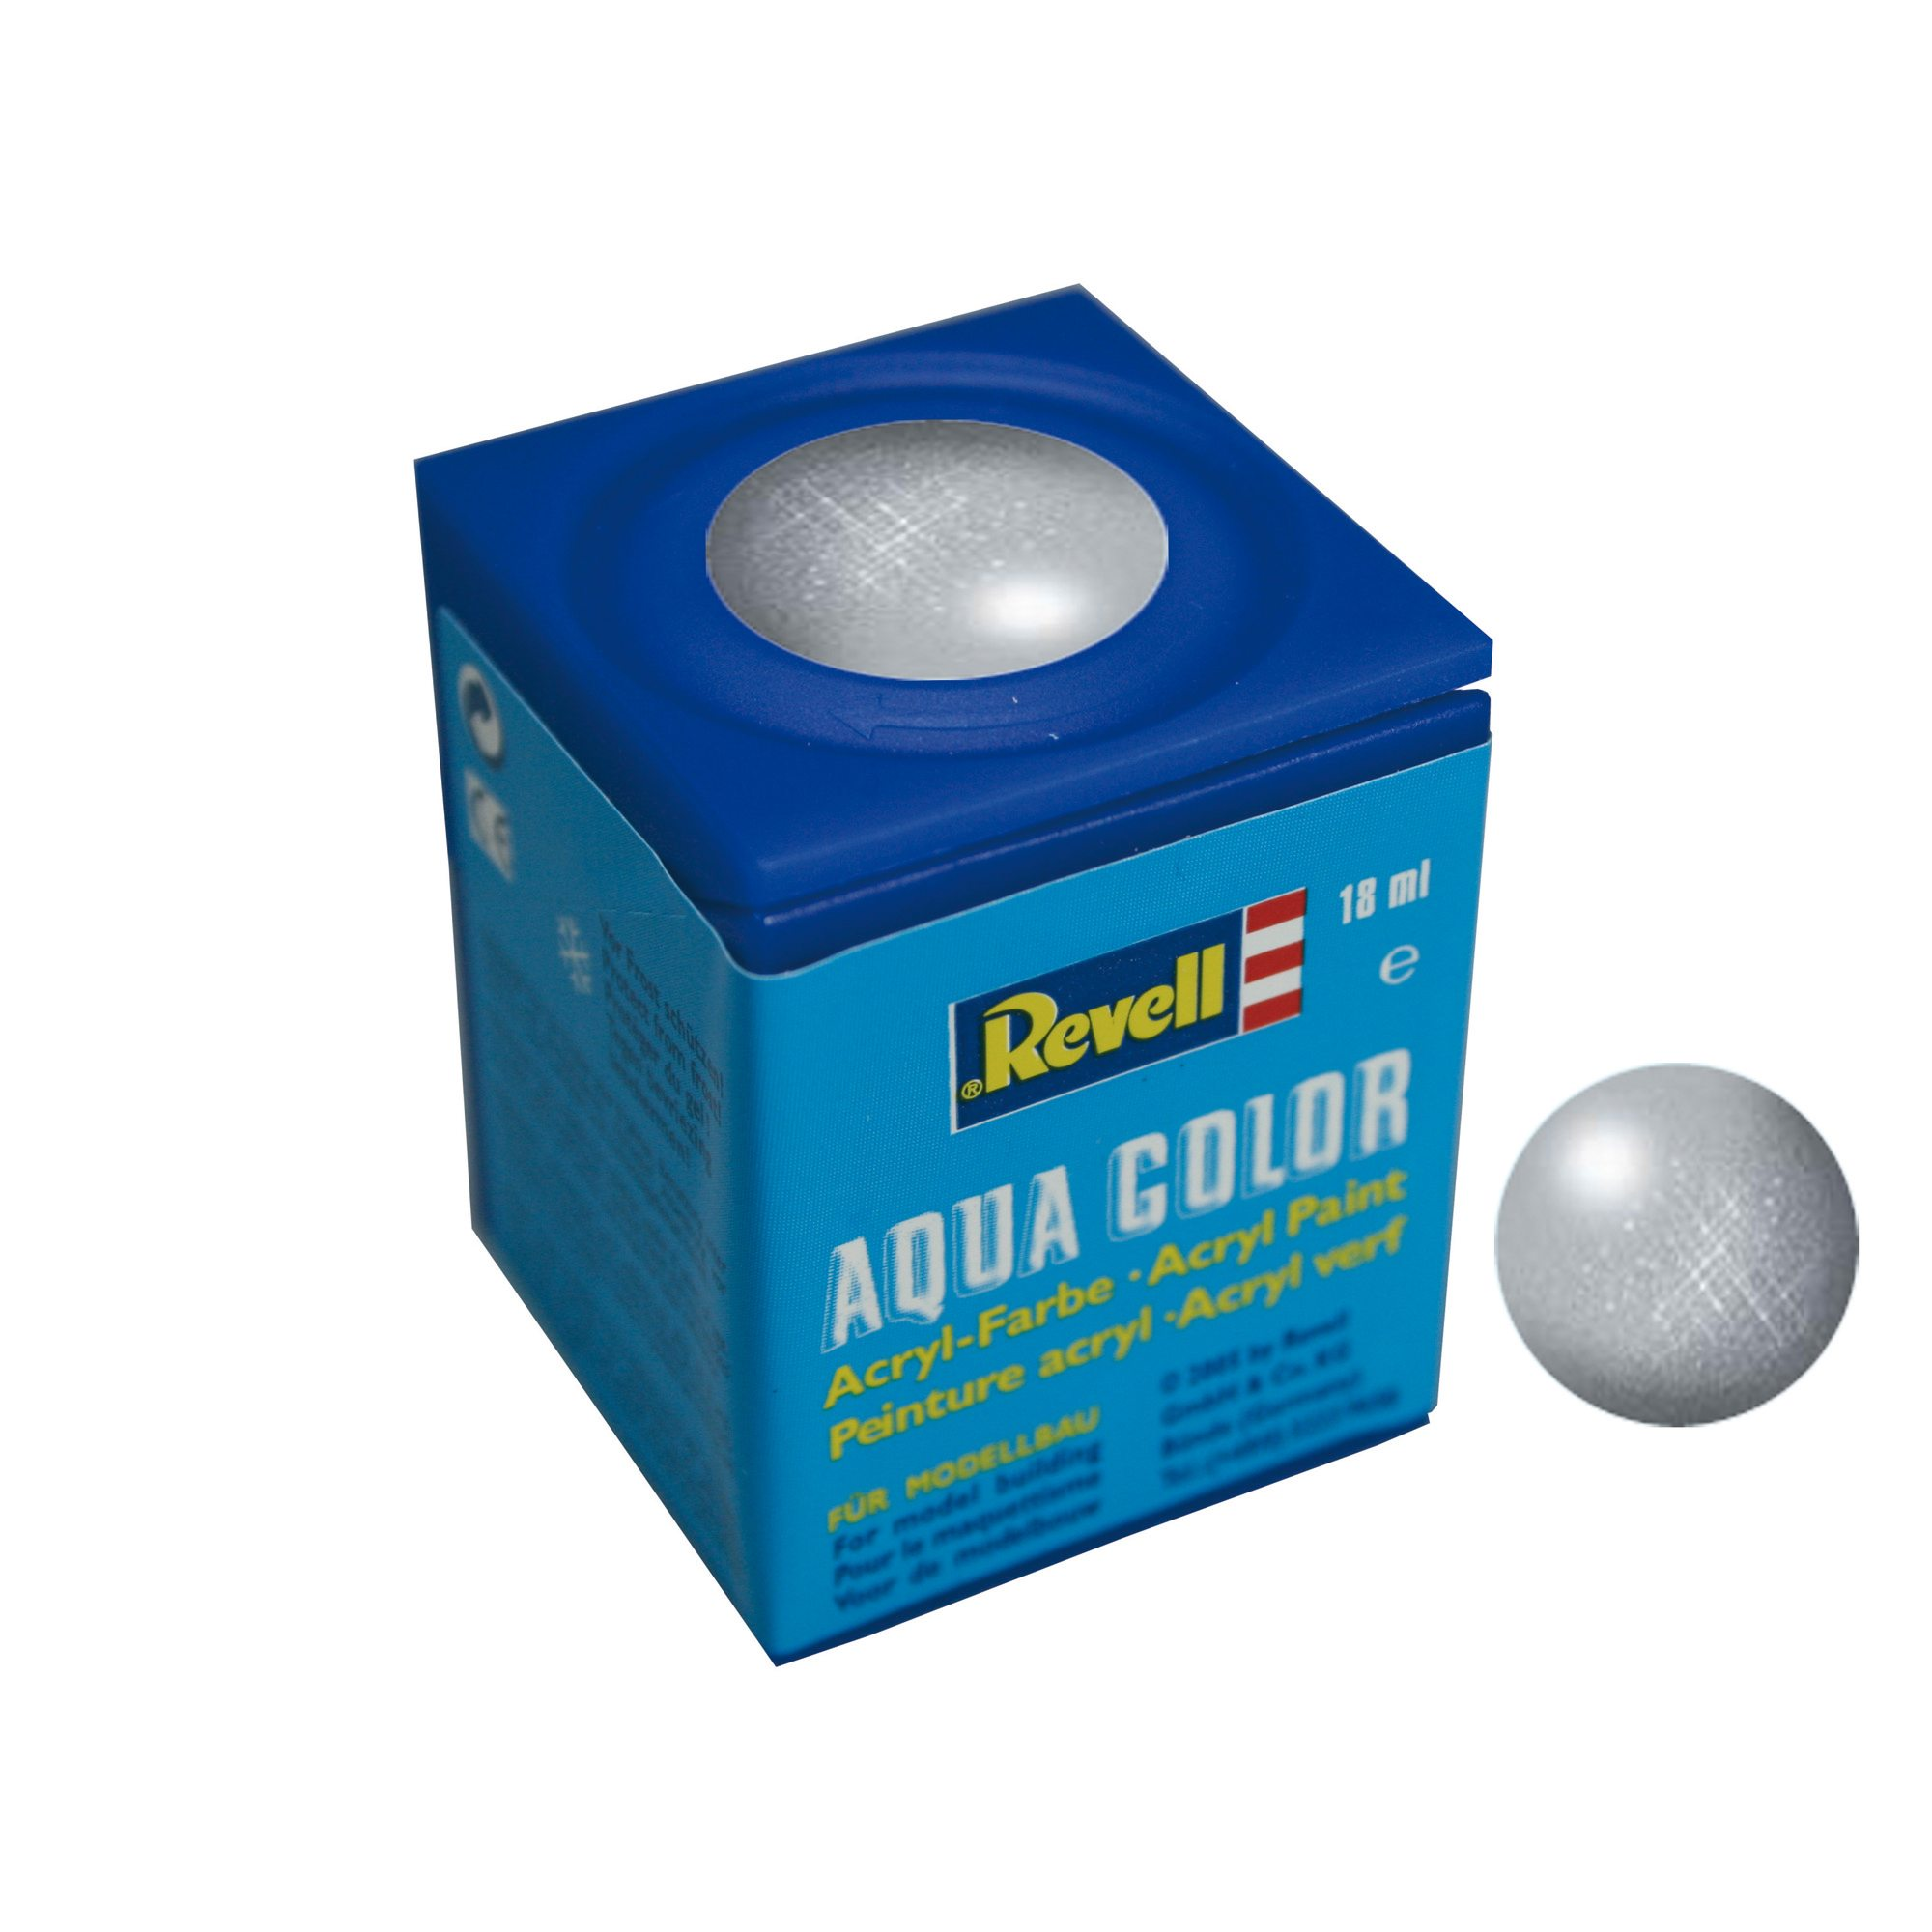 Revell Aqua Color metallic Silber